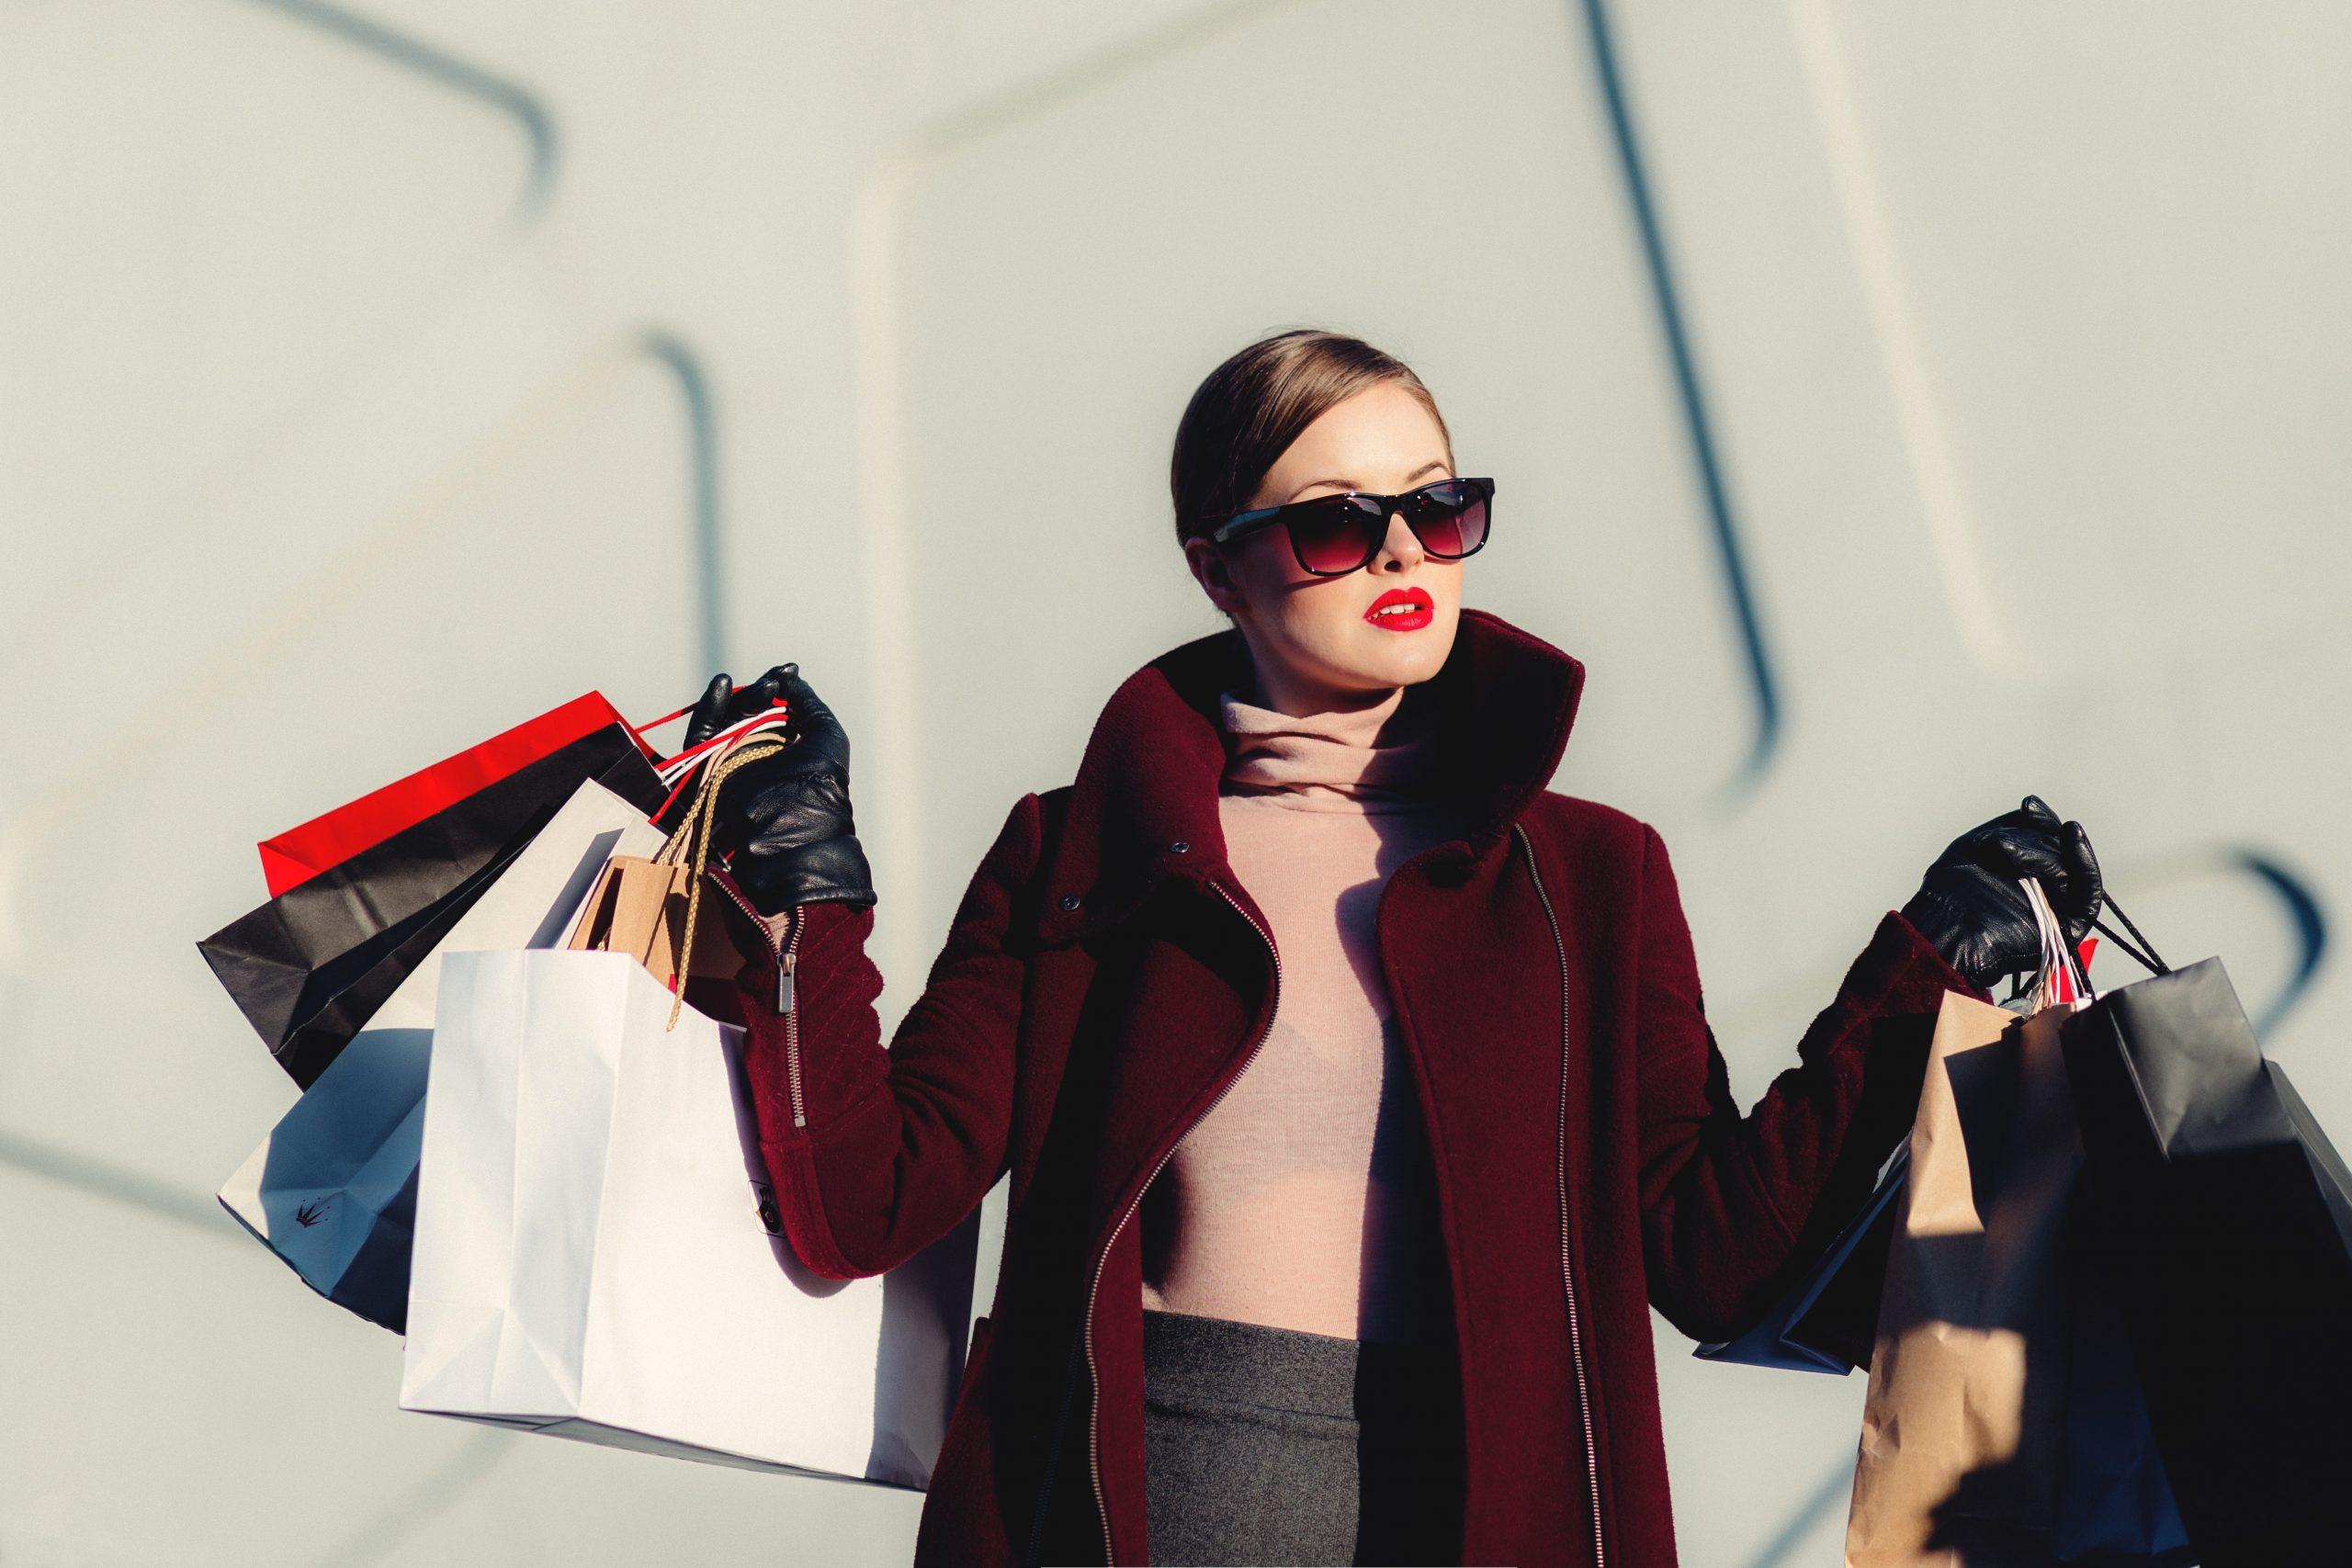 Økonomisk faste med Buy Nothing days